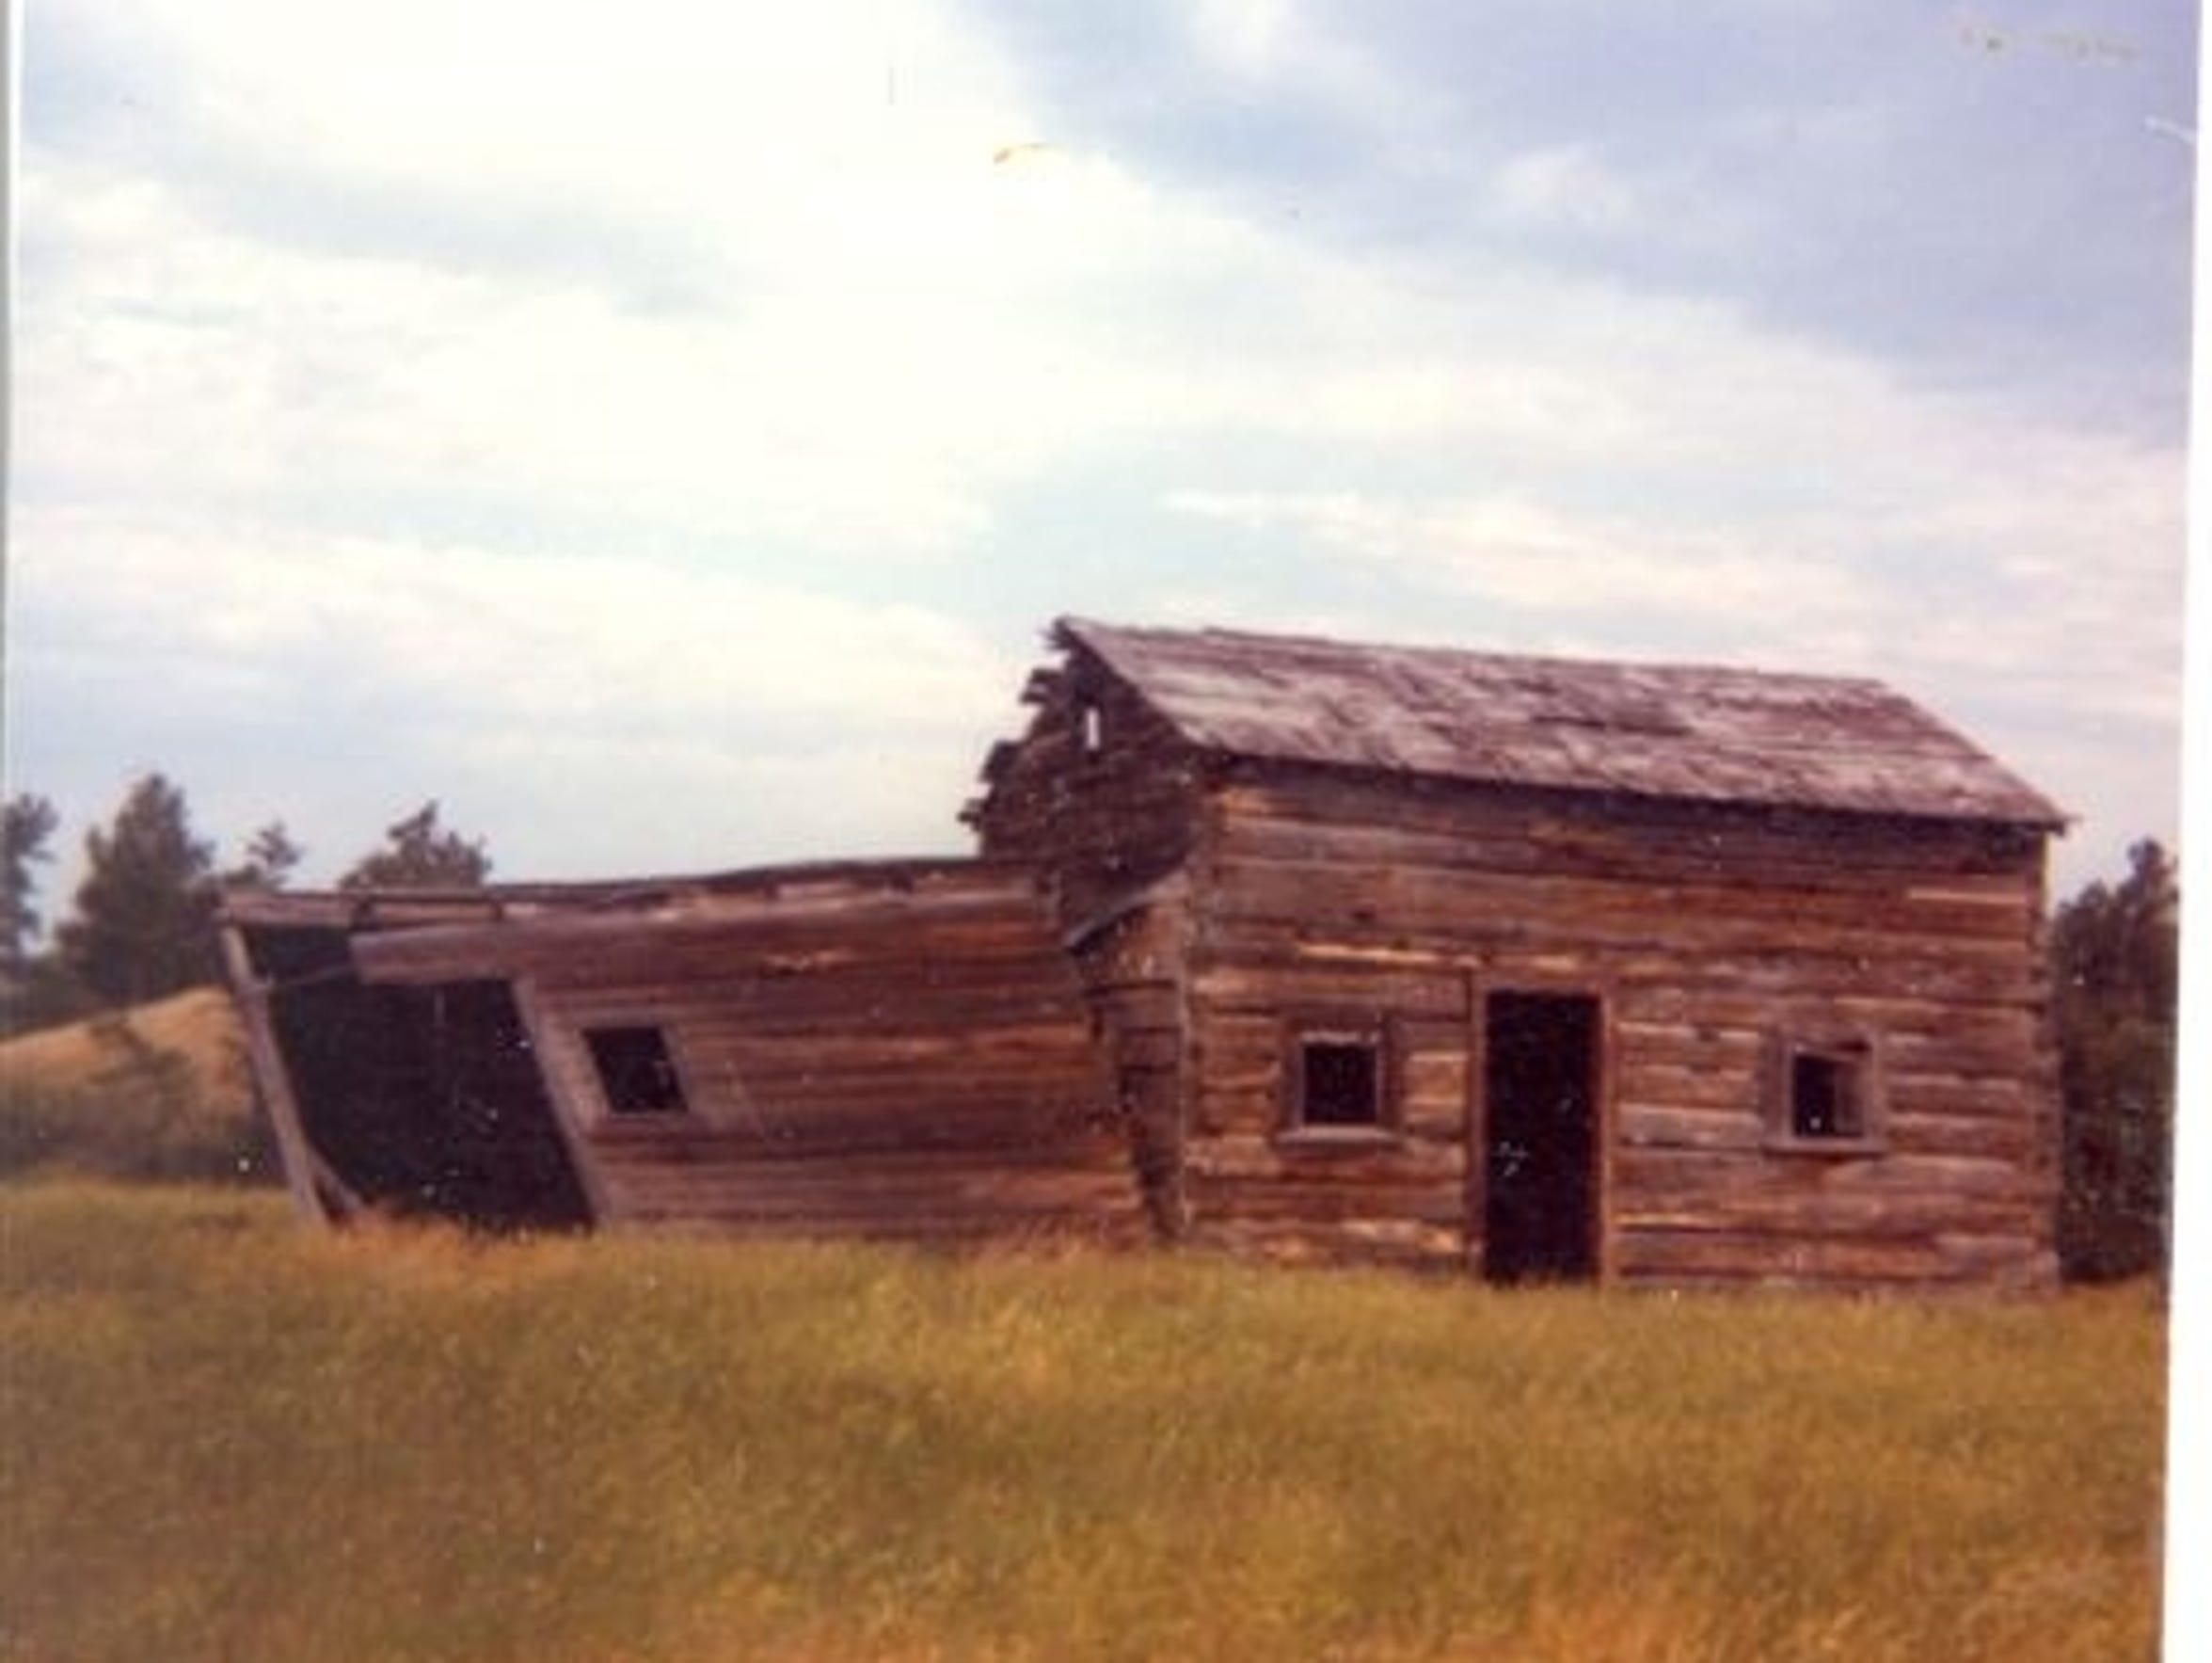 A historic photo shows the Wartzenluft homestead in